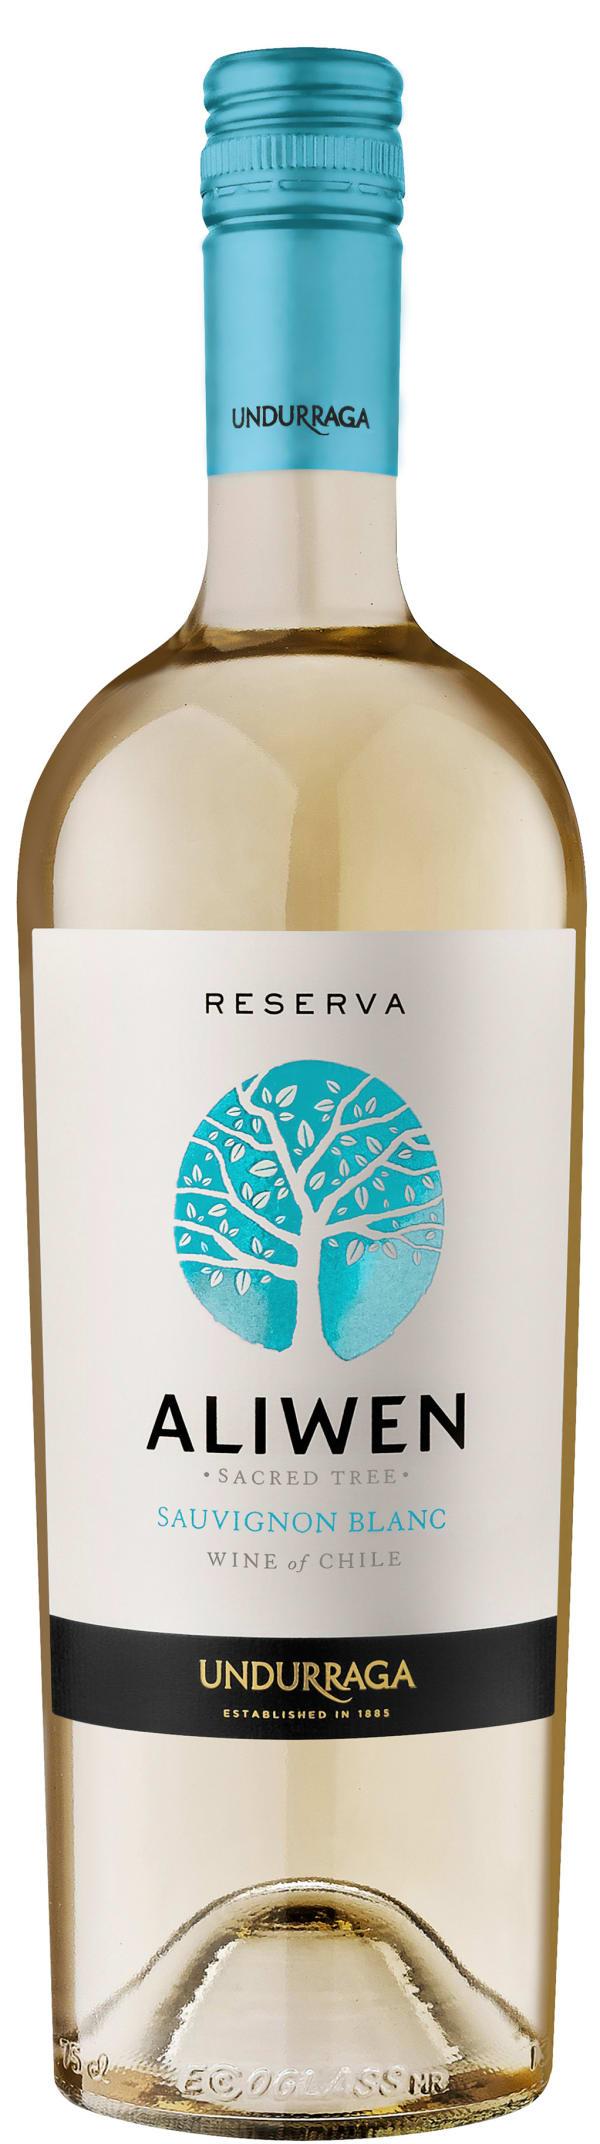 Aliwen Reserva Sauvignon Blanc 2015